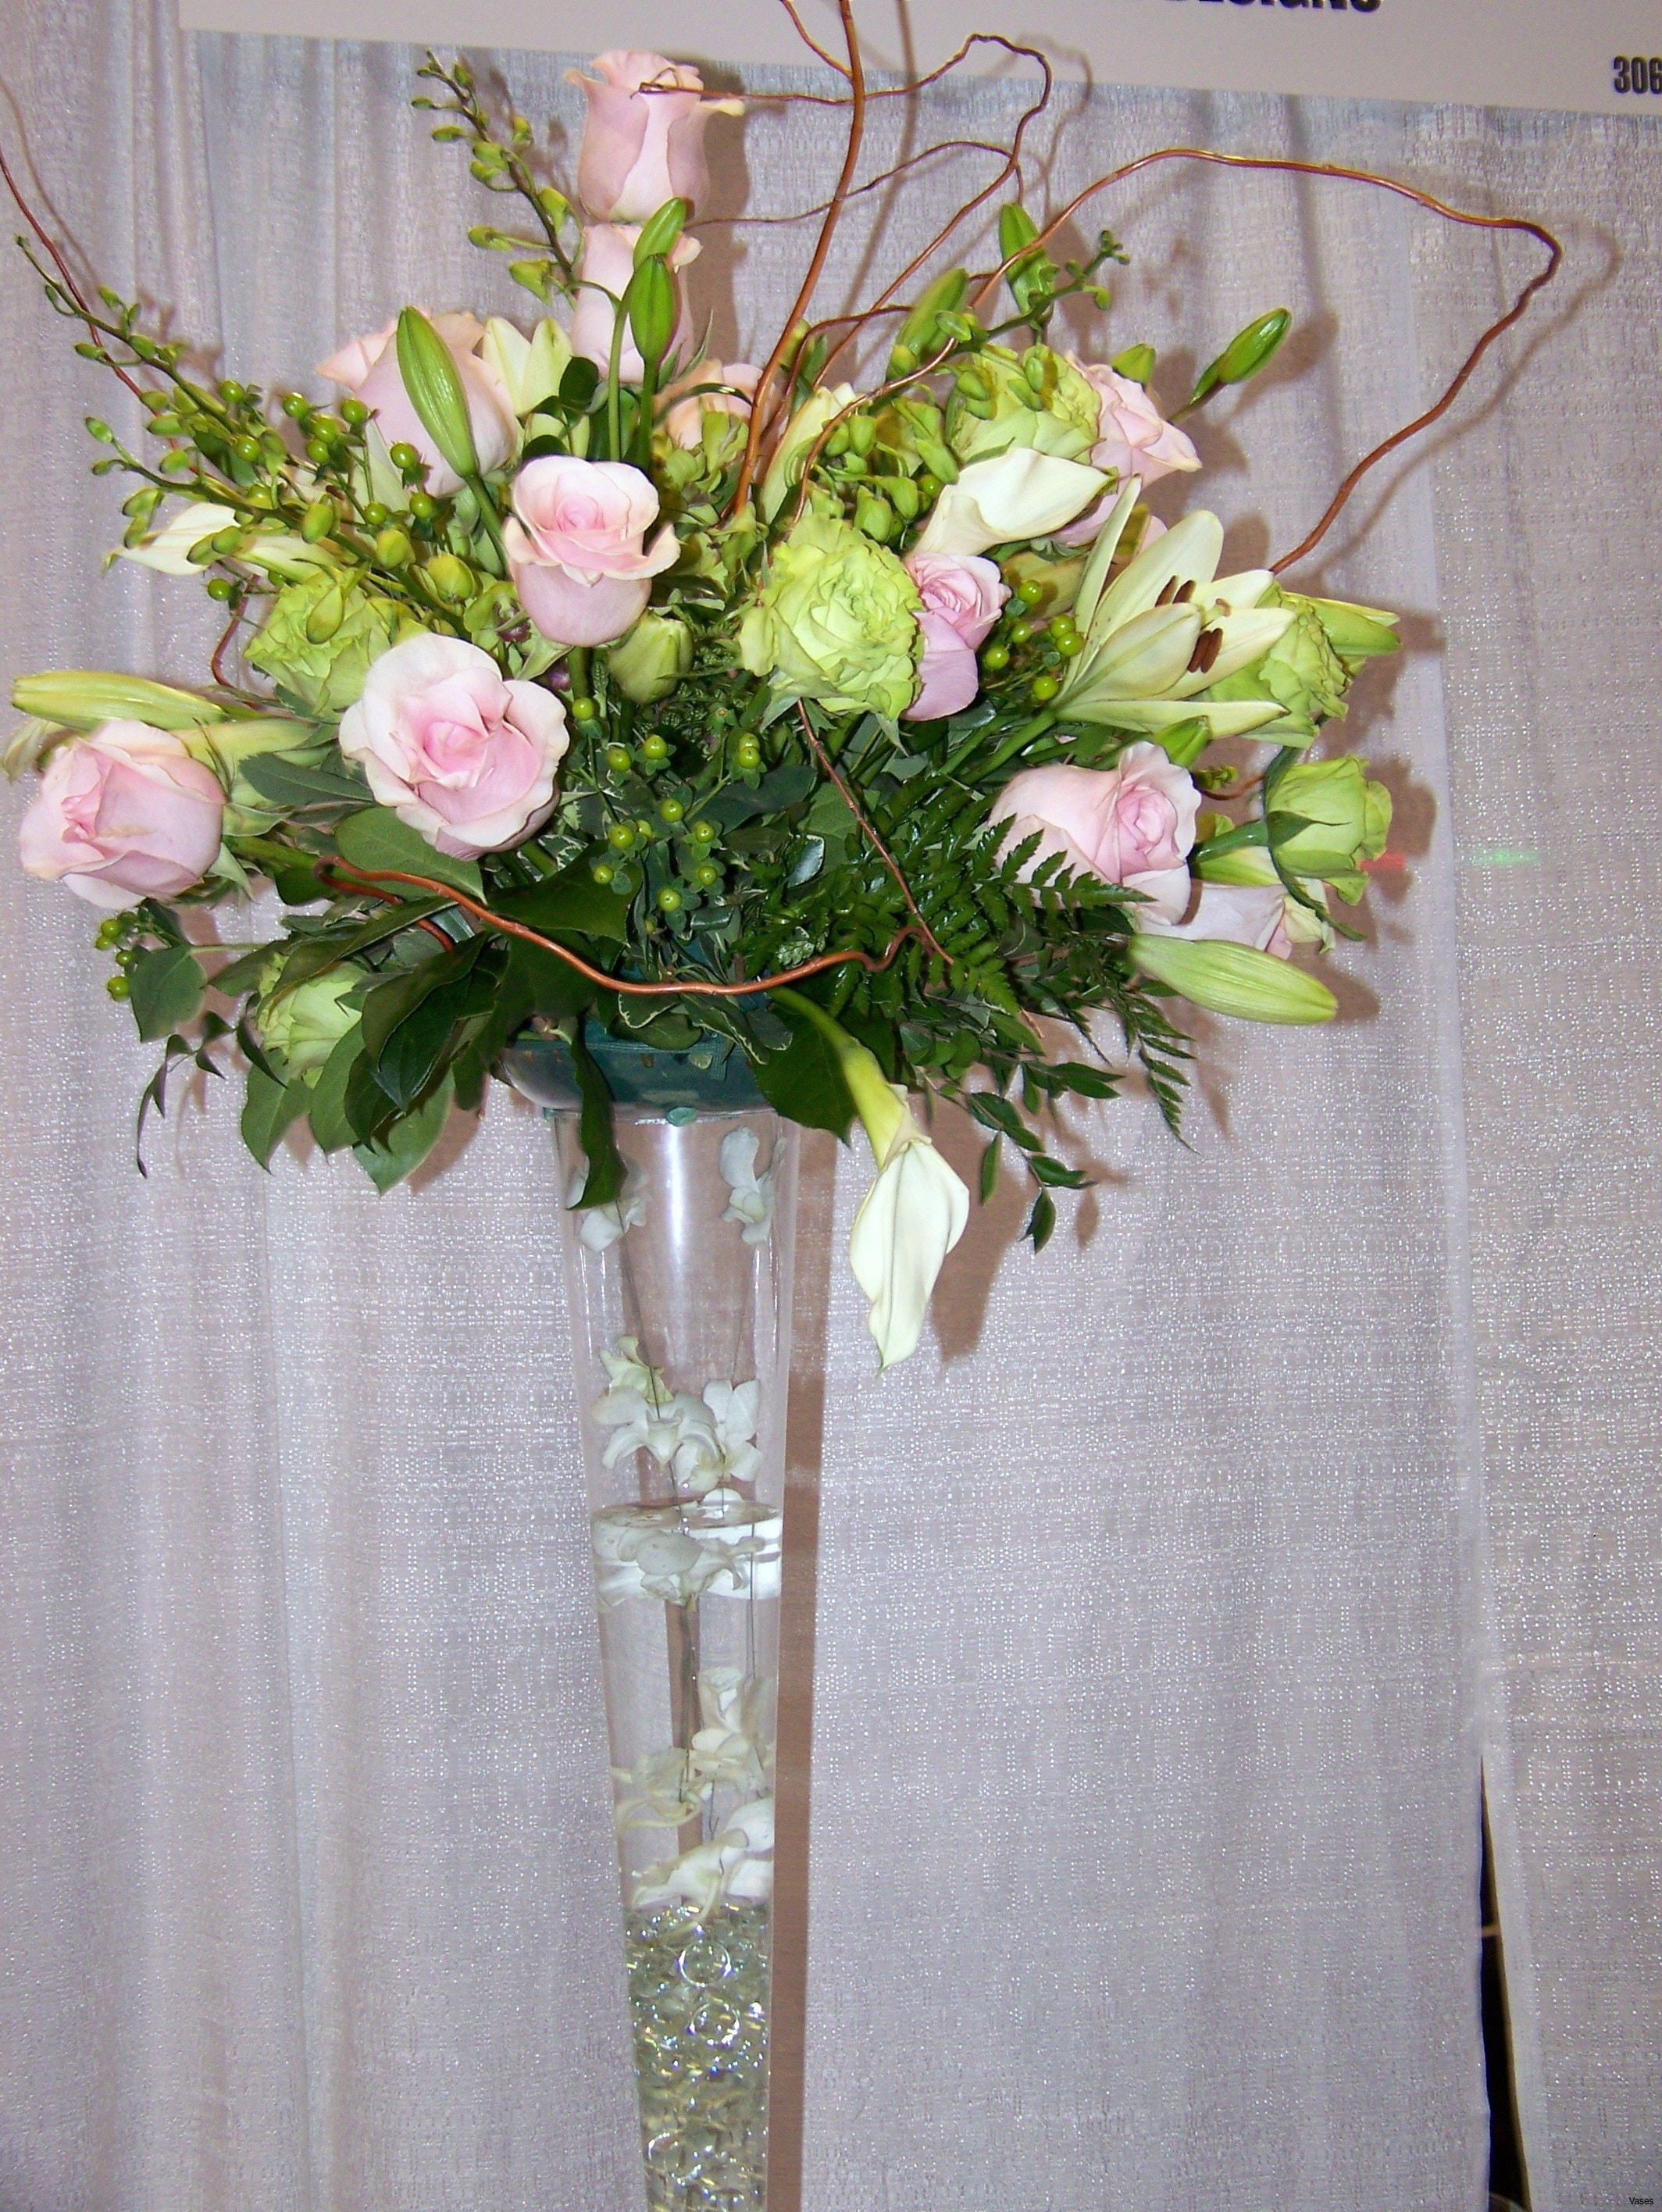 Ww12 & Fish Bowl Flower Arrangements For Weddings